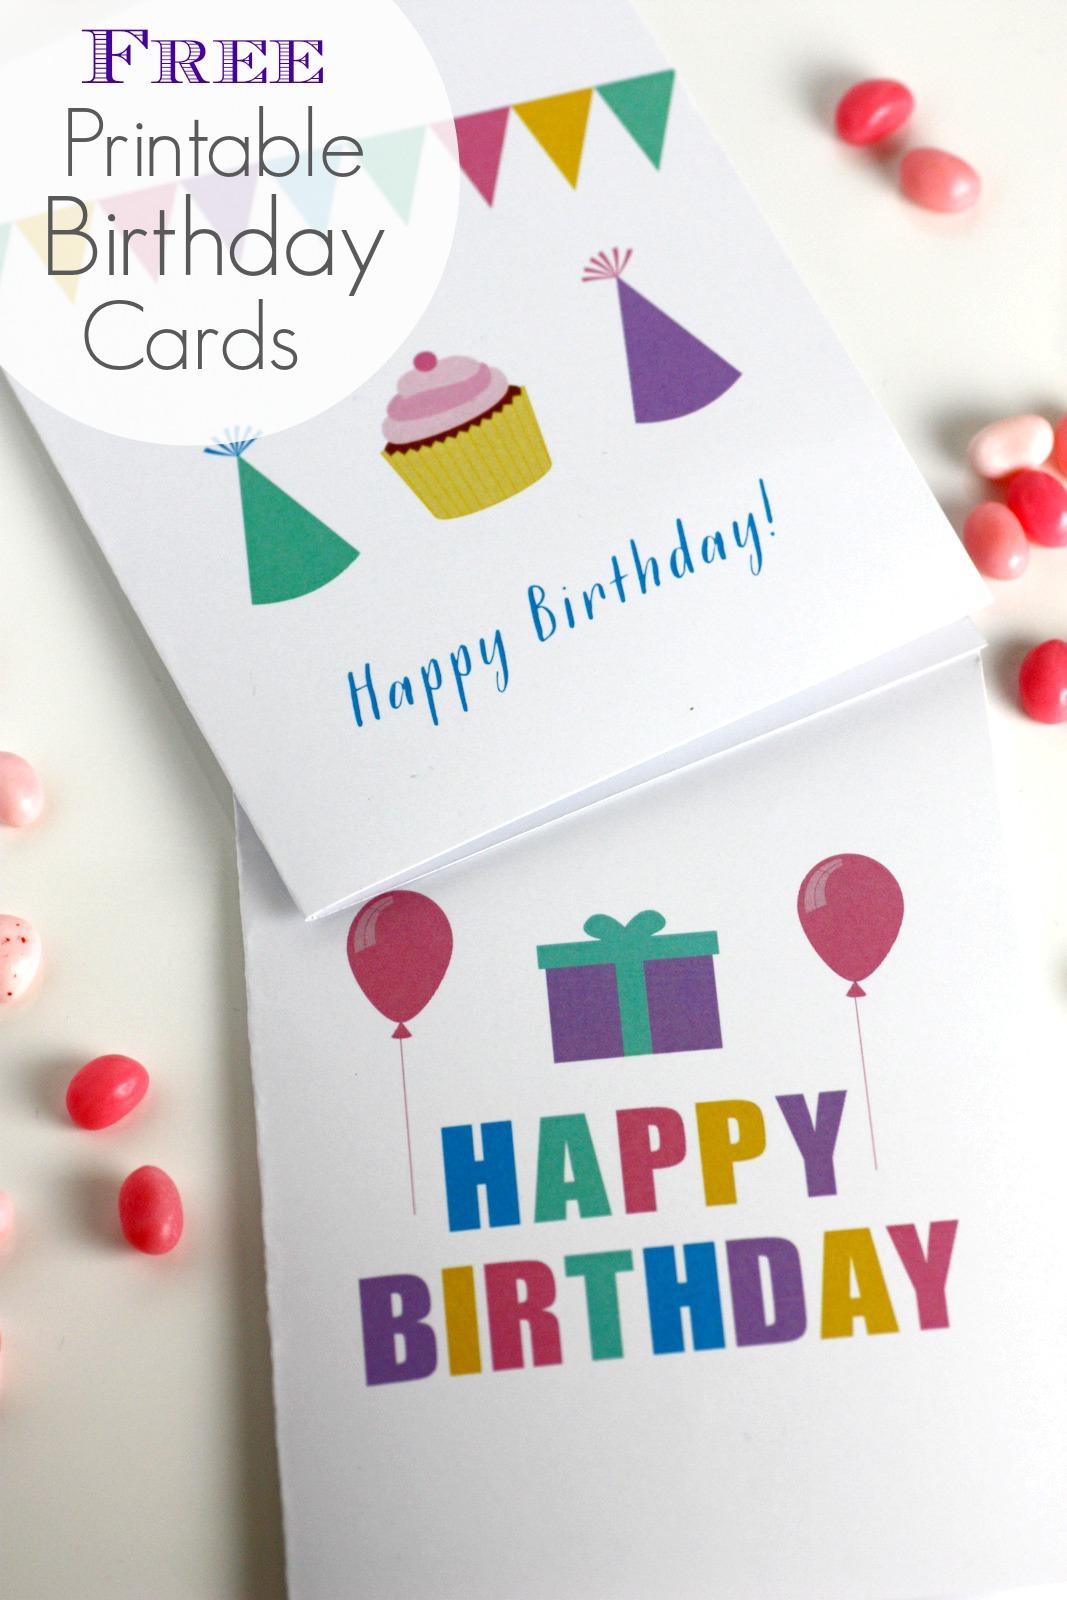 Free Printable Blank Birthday Cards | Catch My Party - Happy Birthday Free Cards Printable